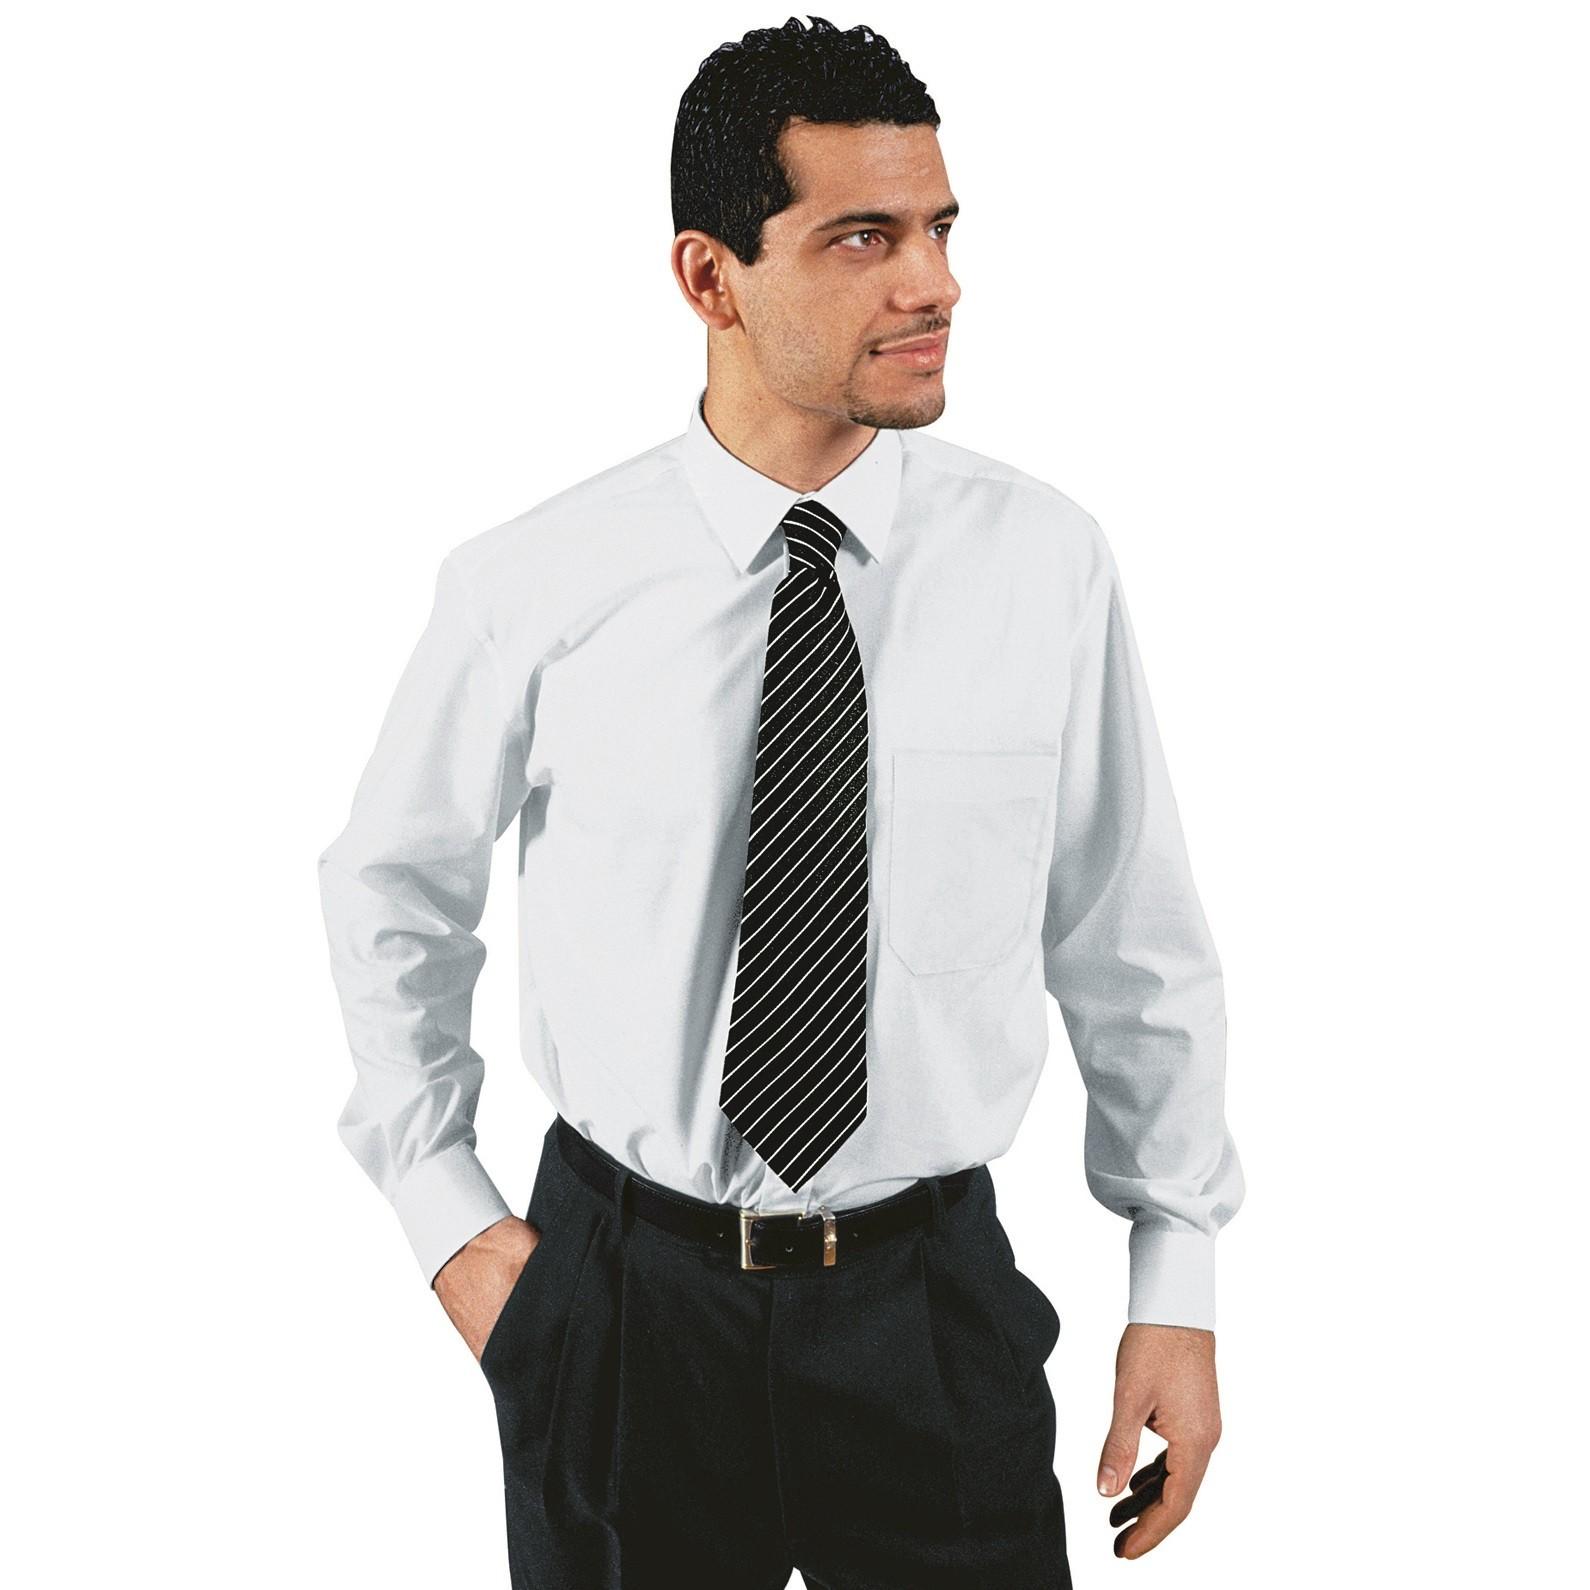 Camice Uomo Antiacido Bianco Cm 100 Poliestere XL Cotone ISACCO